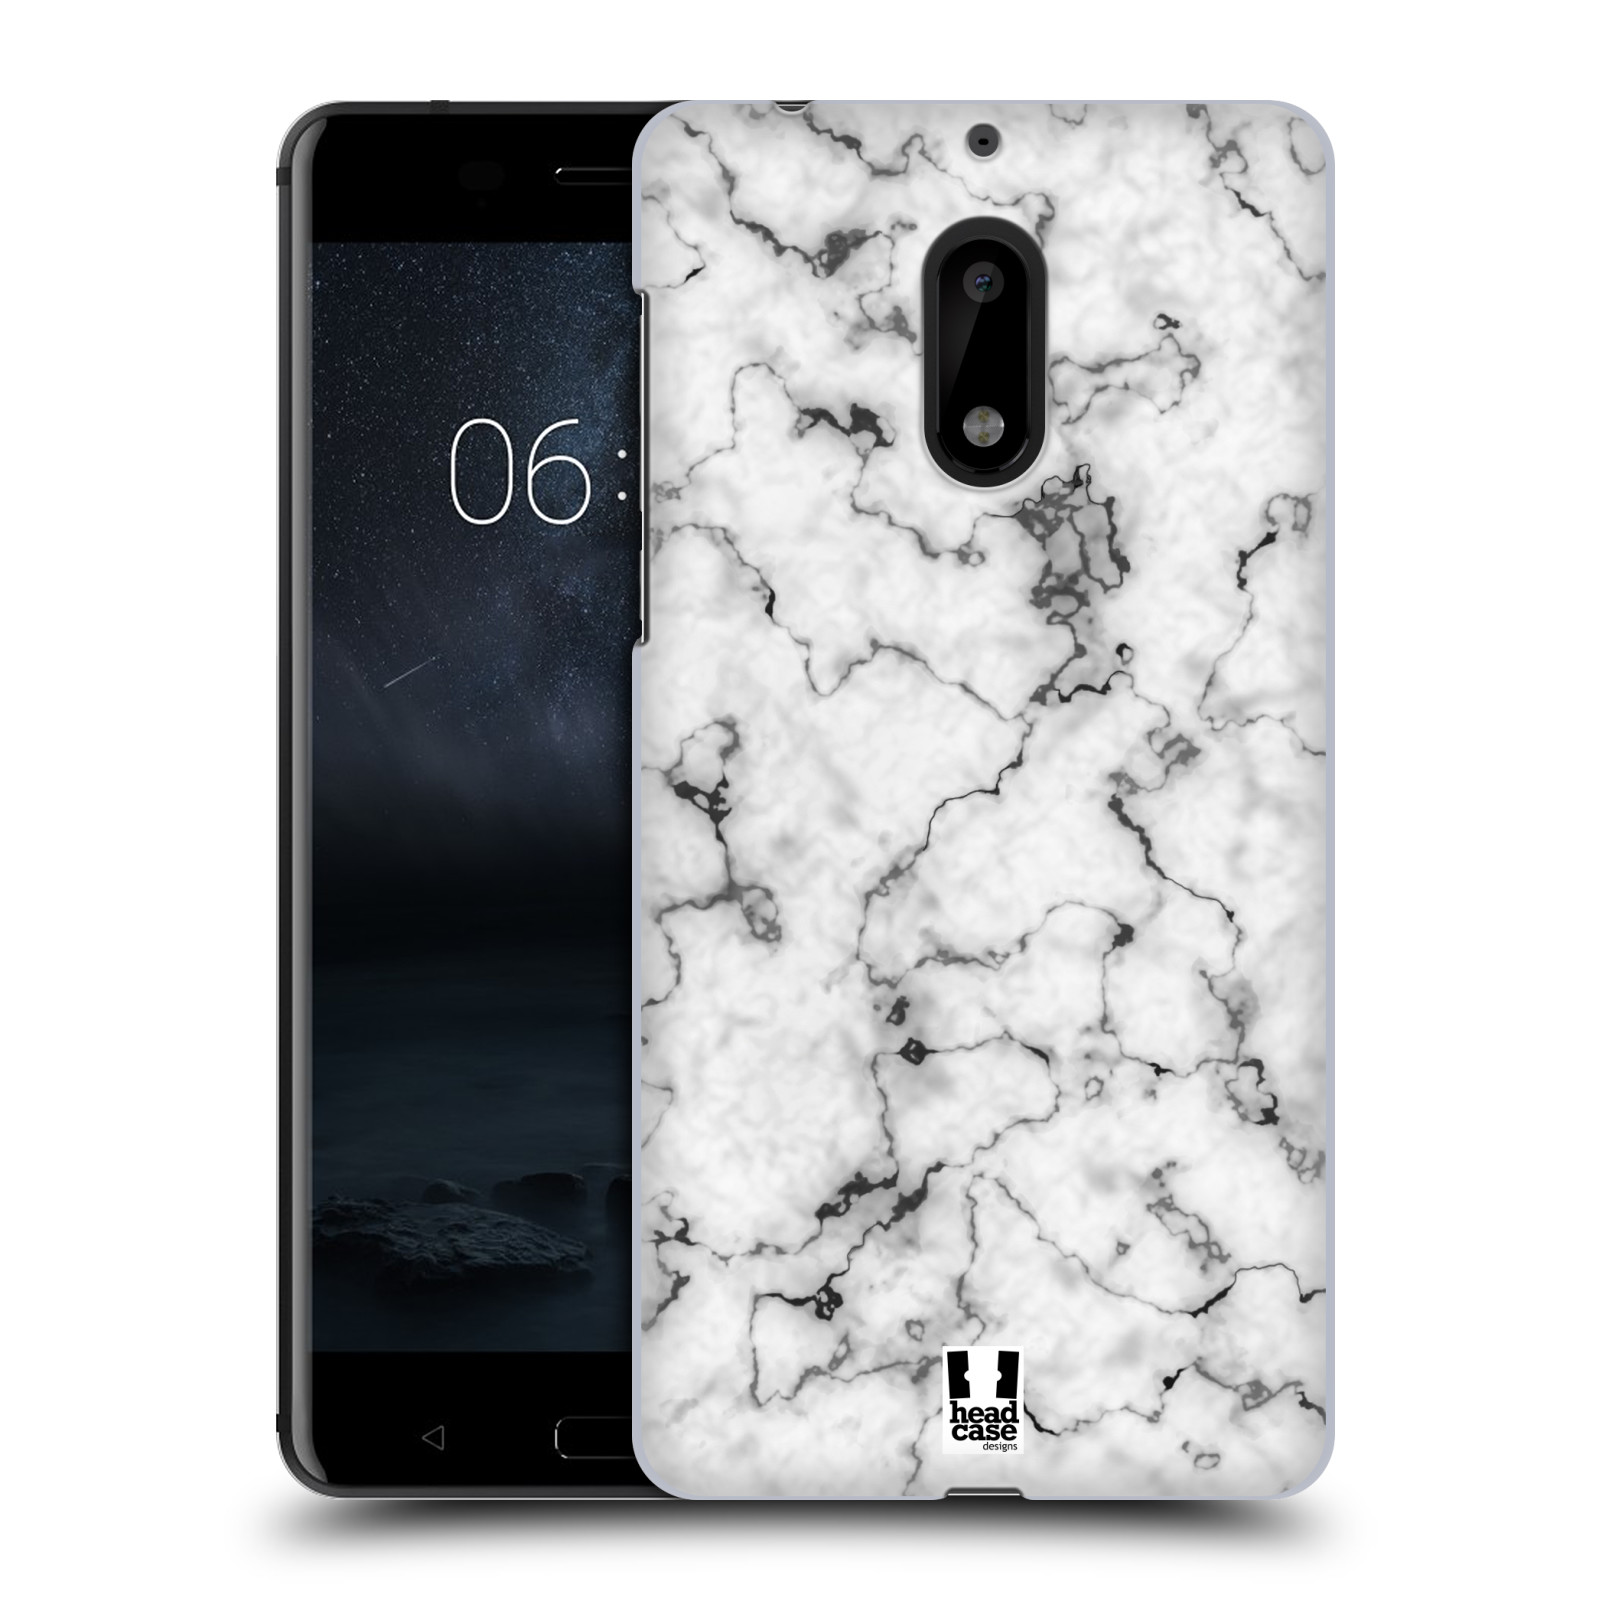 Plastové pouzdro na mobil Nokia 6 - Head Case - Bílý mramor (Plastový kryt či obal na mobilní telefon s motivem Bílý mramor pro Nokia 6 (Dual SIM))